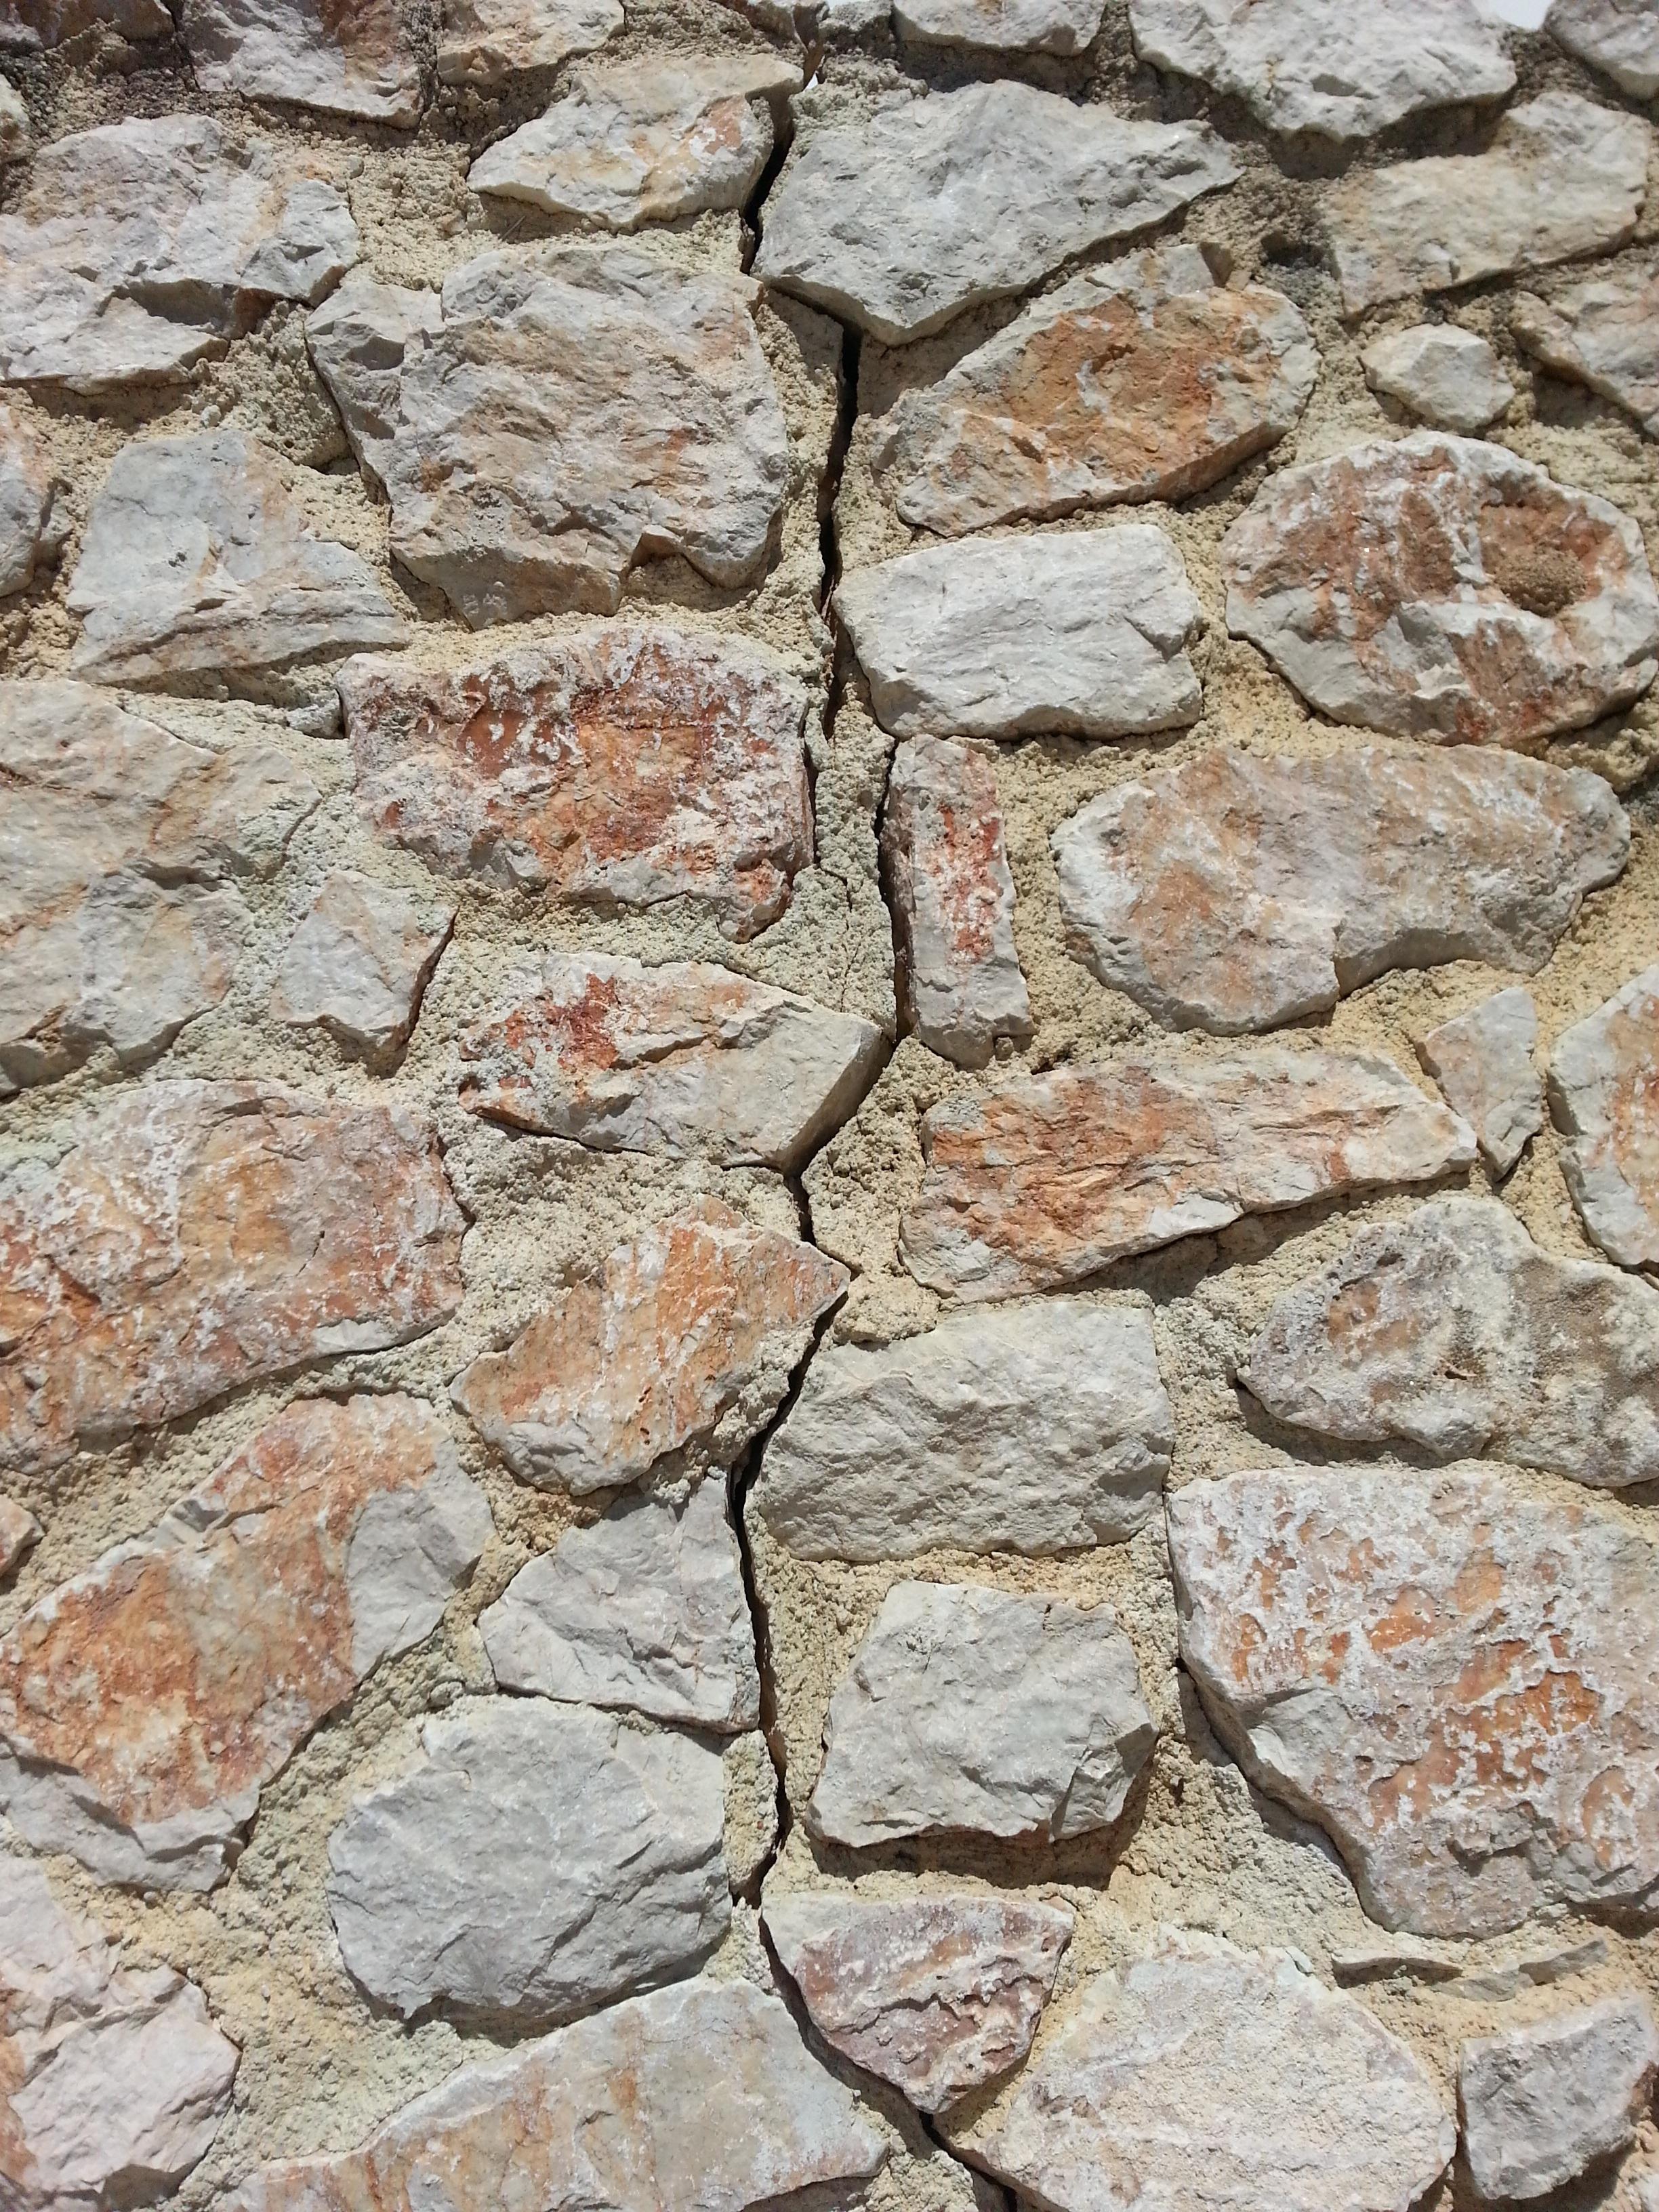 rock structure wood floor cobblestone wall soil